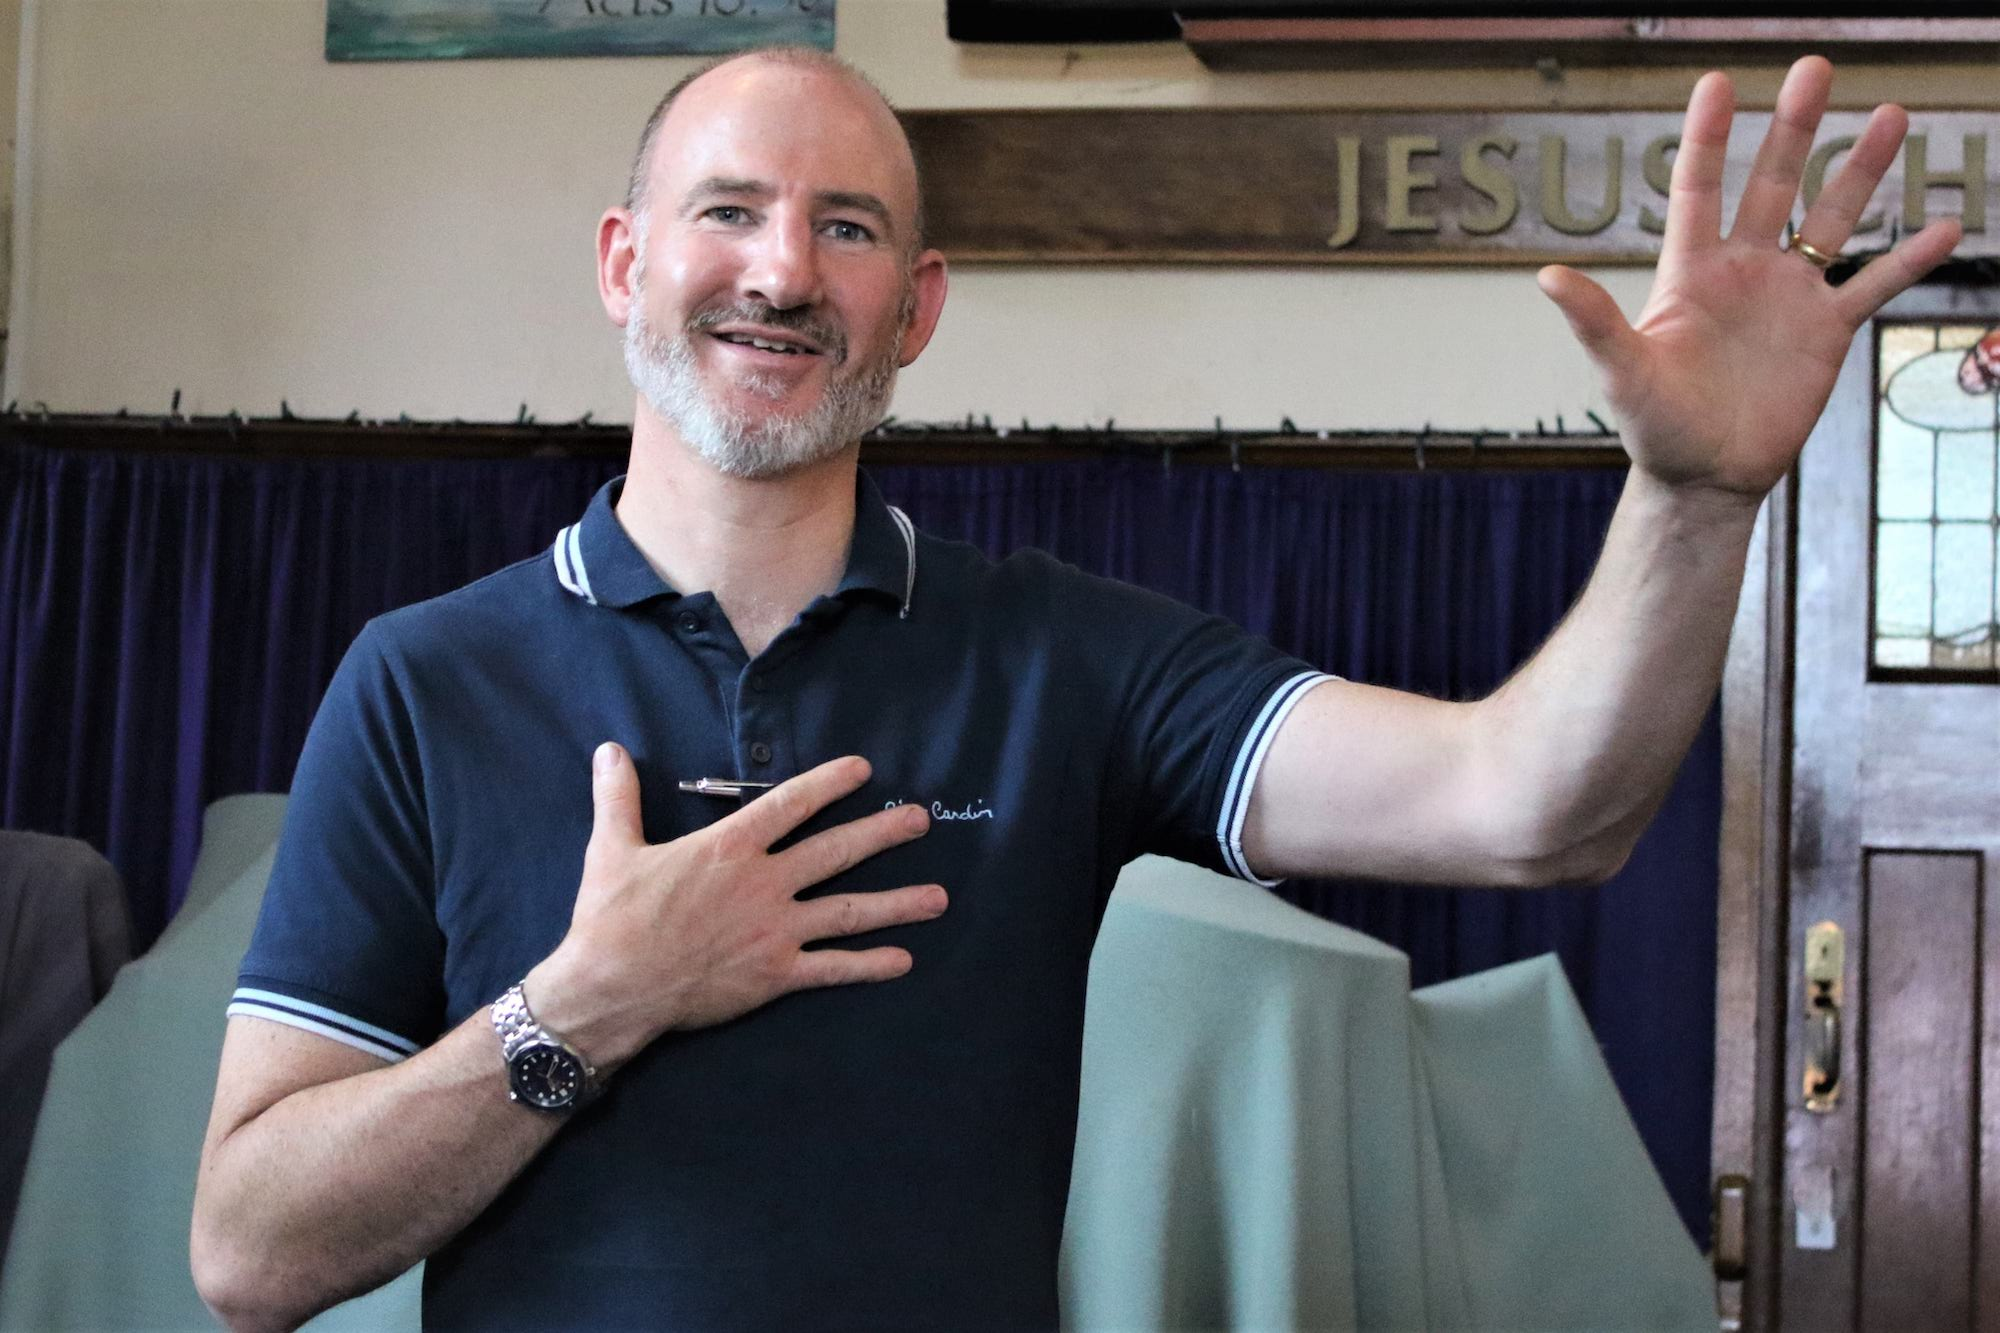 Green Street Green - Pastor Mid Sermon